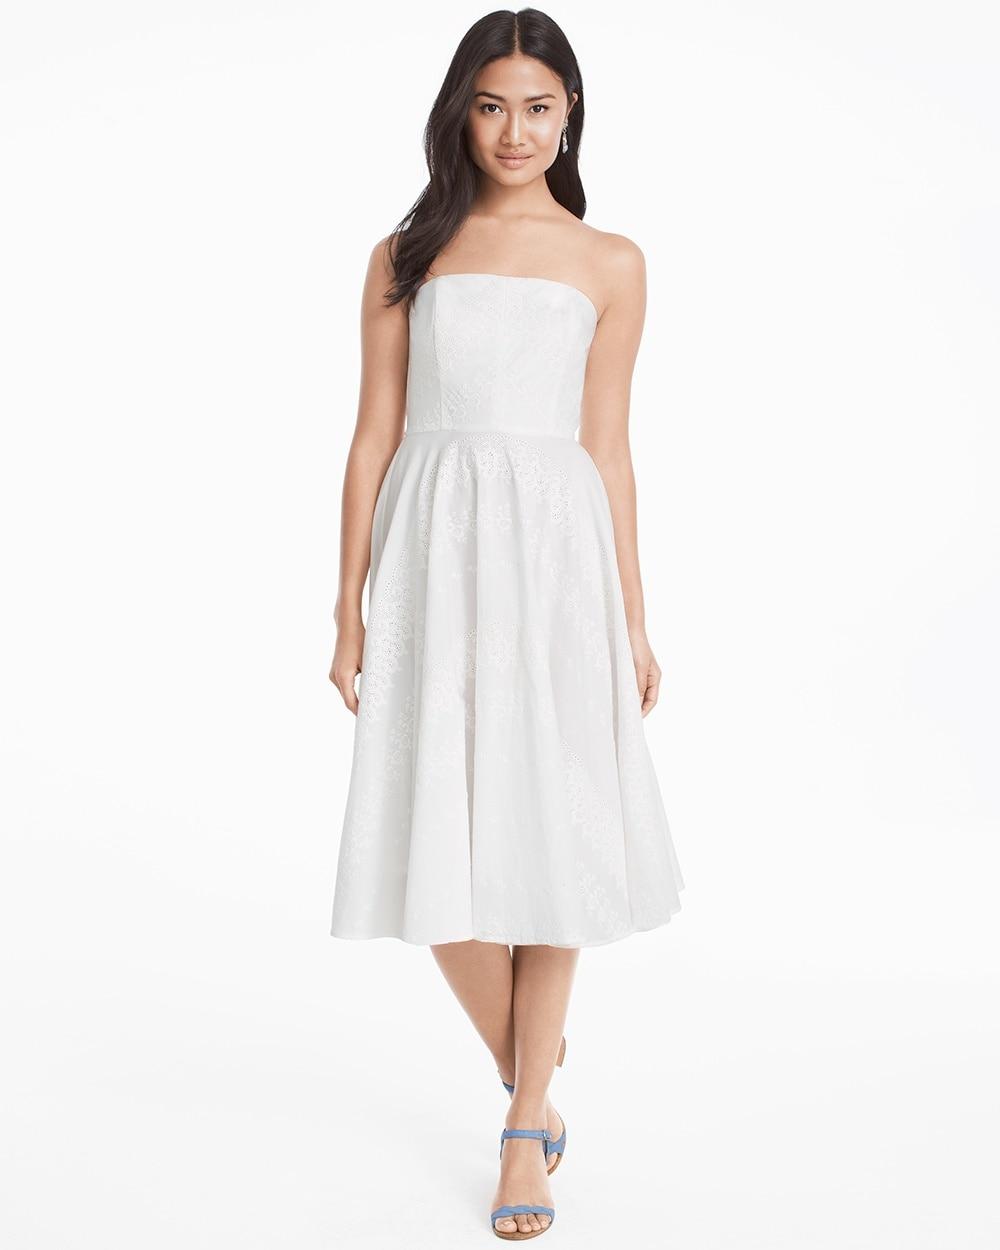 Strapless Eyelet White Fit And Flare Dress White House Black Market